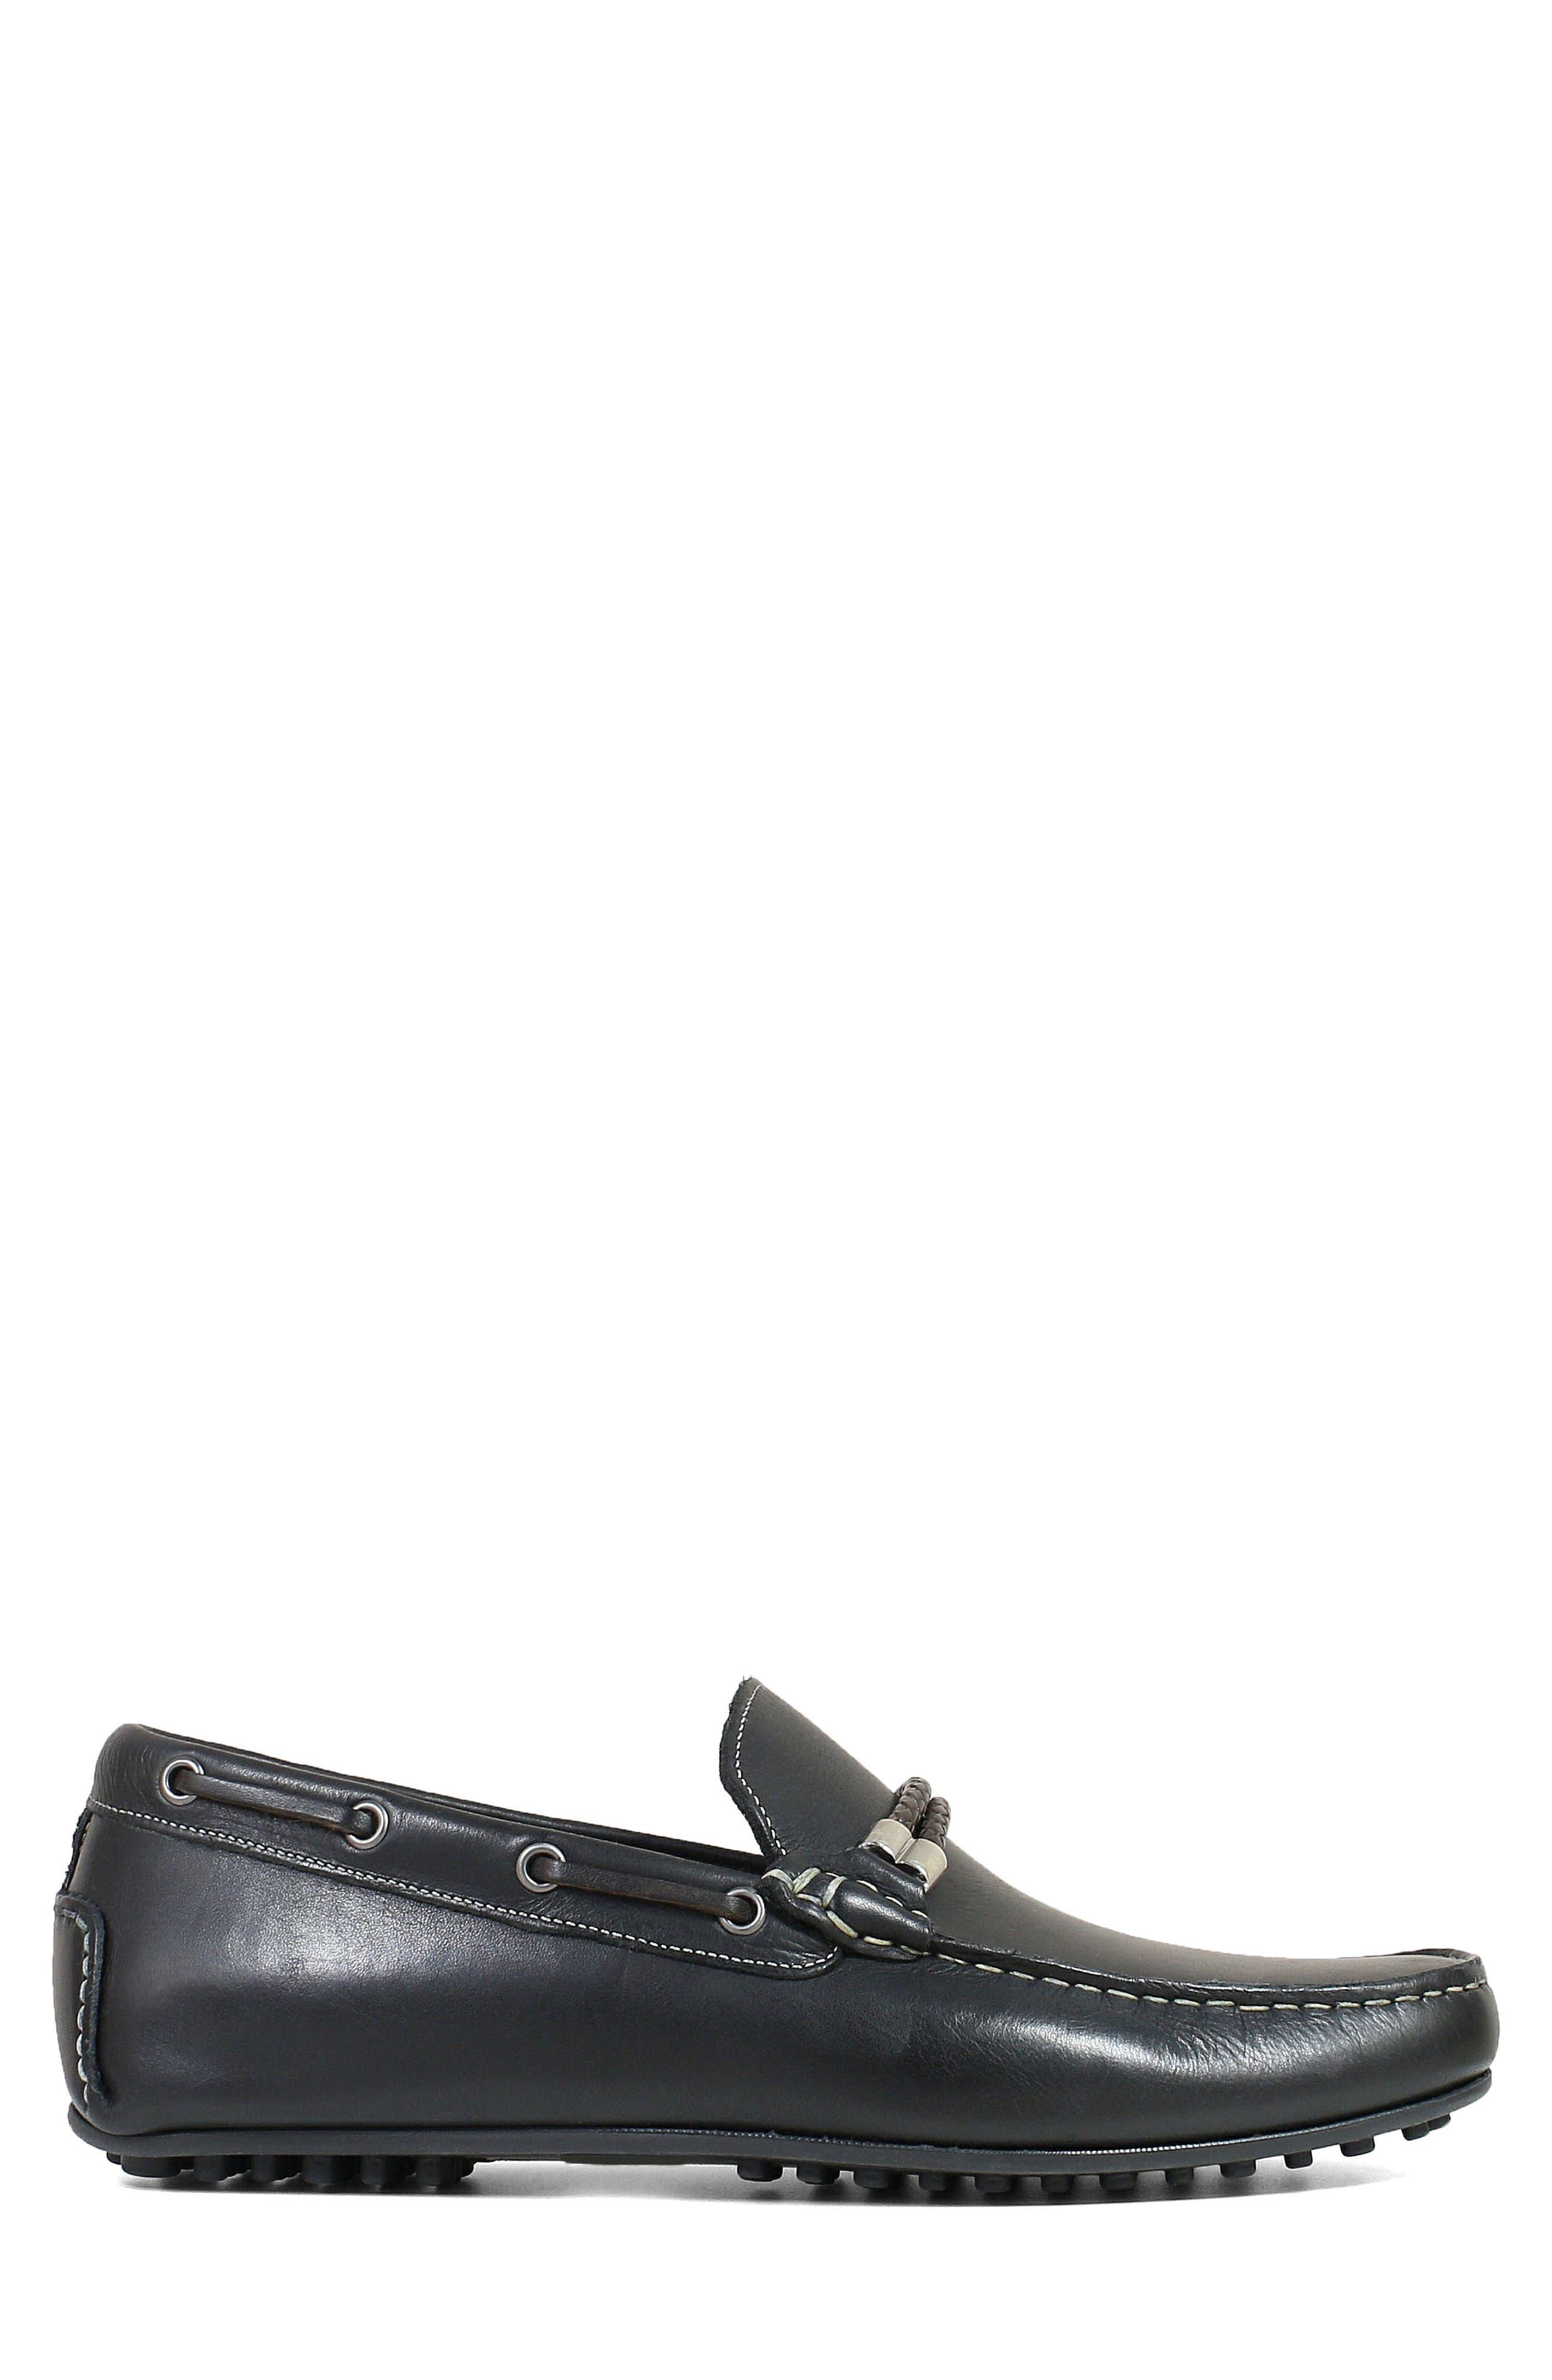 FLORSHEIM,                             Imperial Comet Driving Shoe,                             Alternate thumbnail 3, color,                             BLACK LEATHER